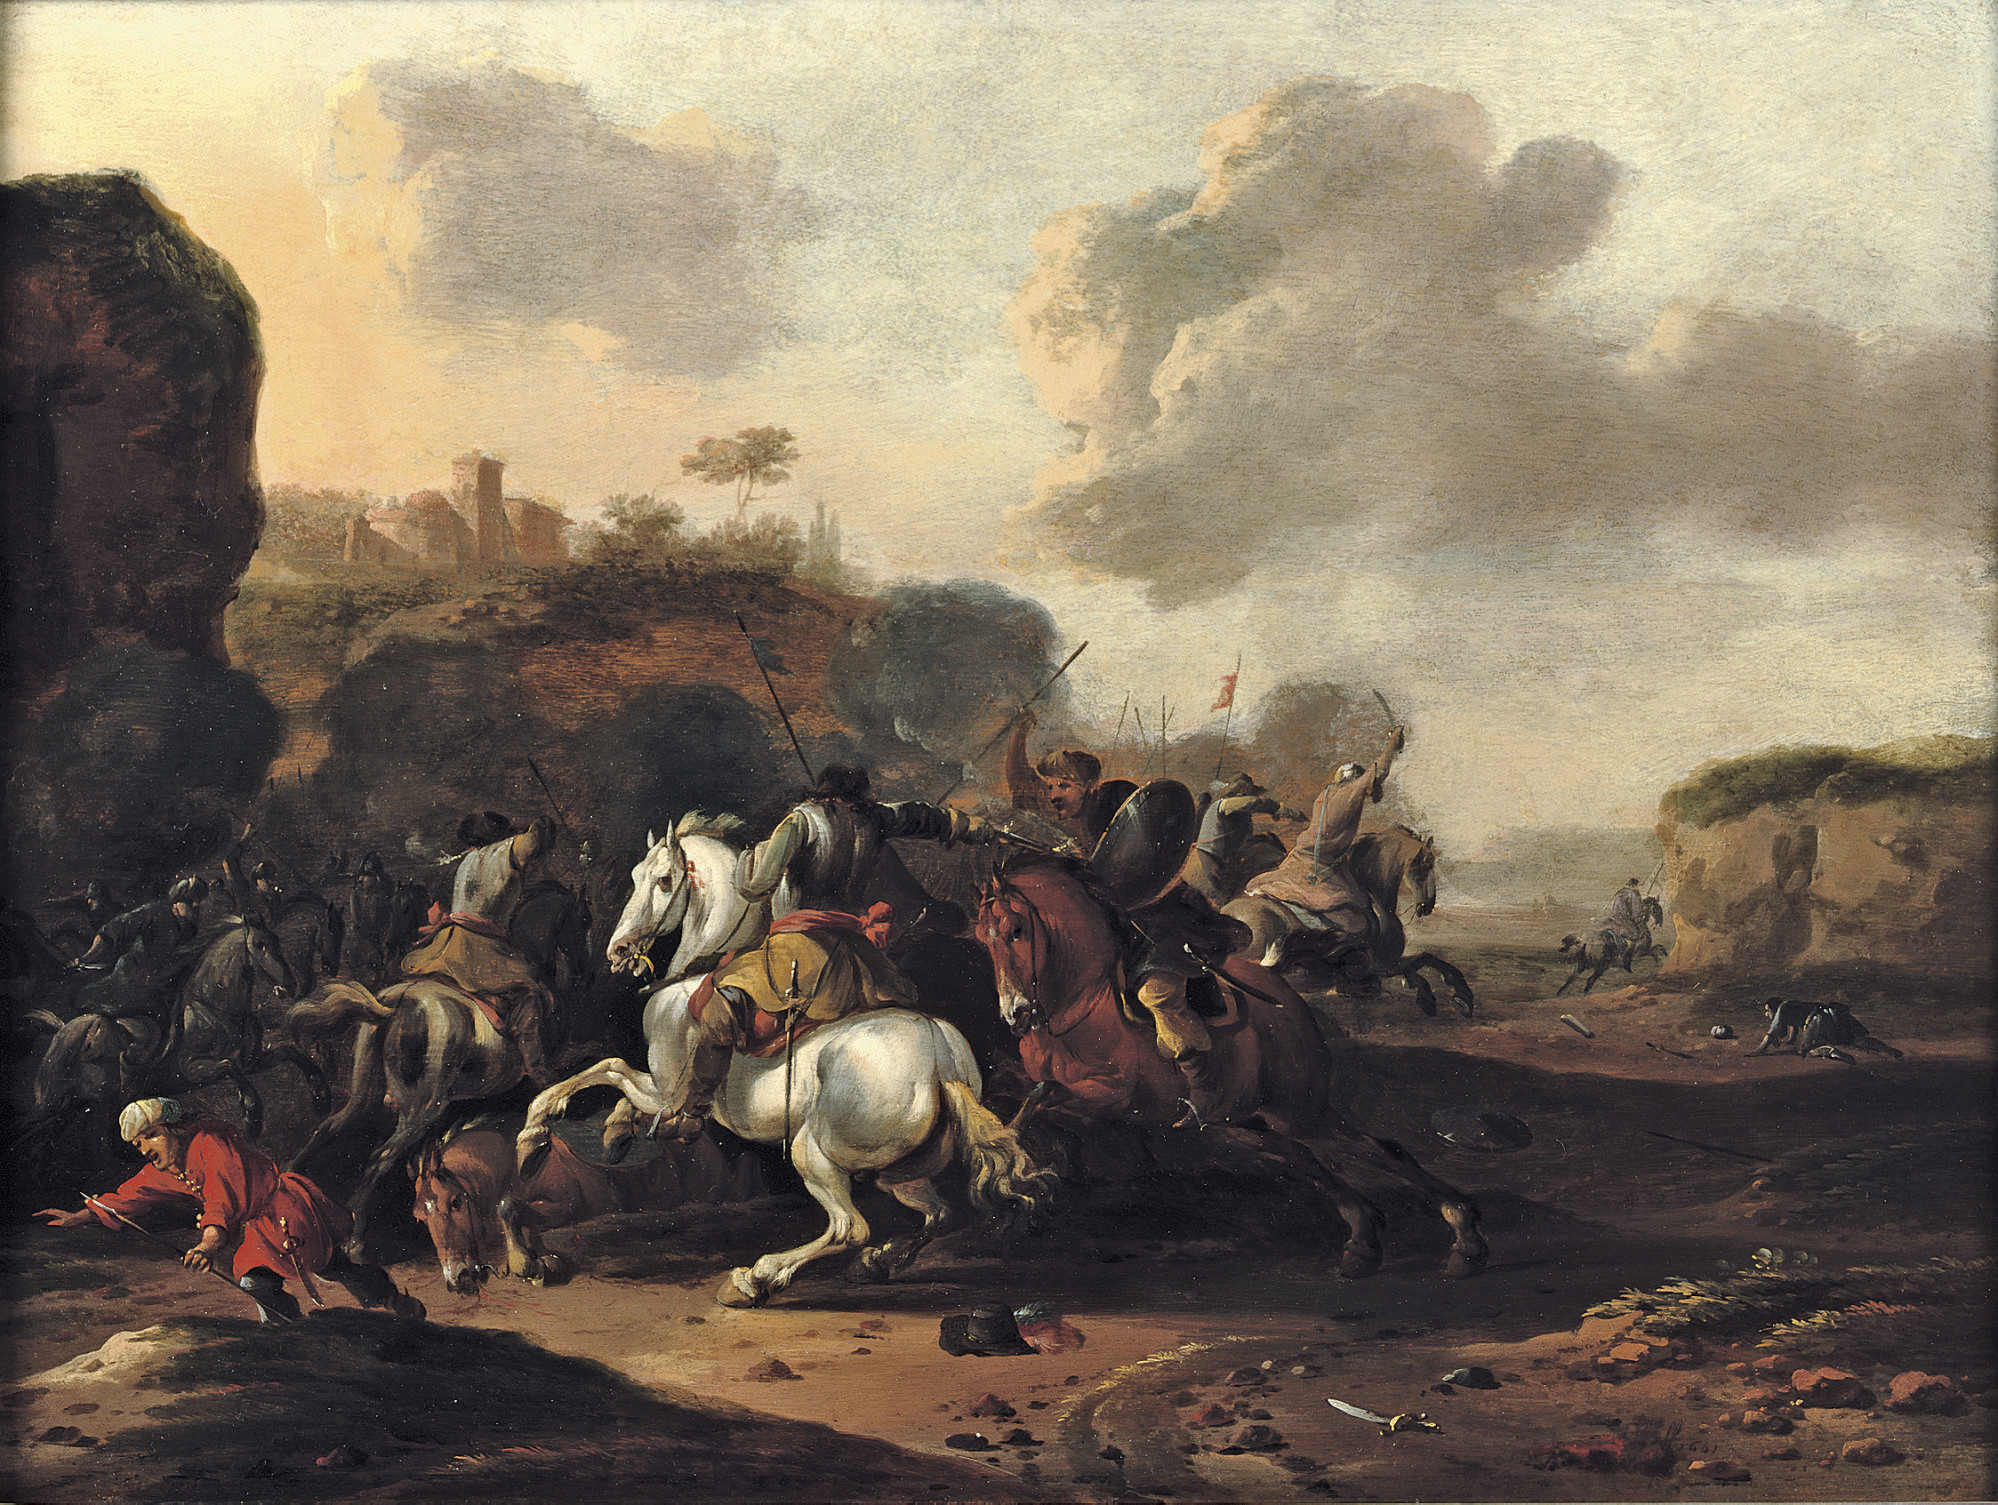 A cavalry skirmish in a rocky Italianate landscape